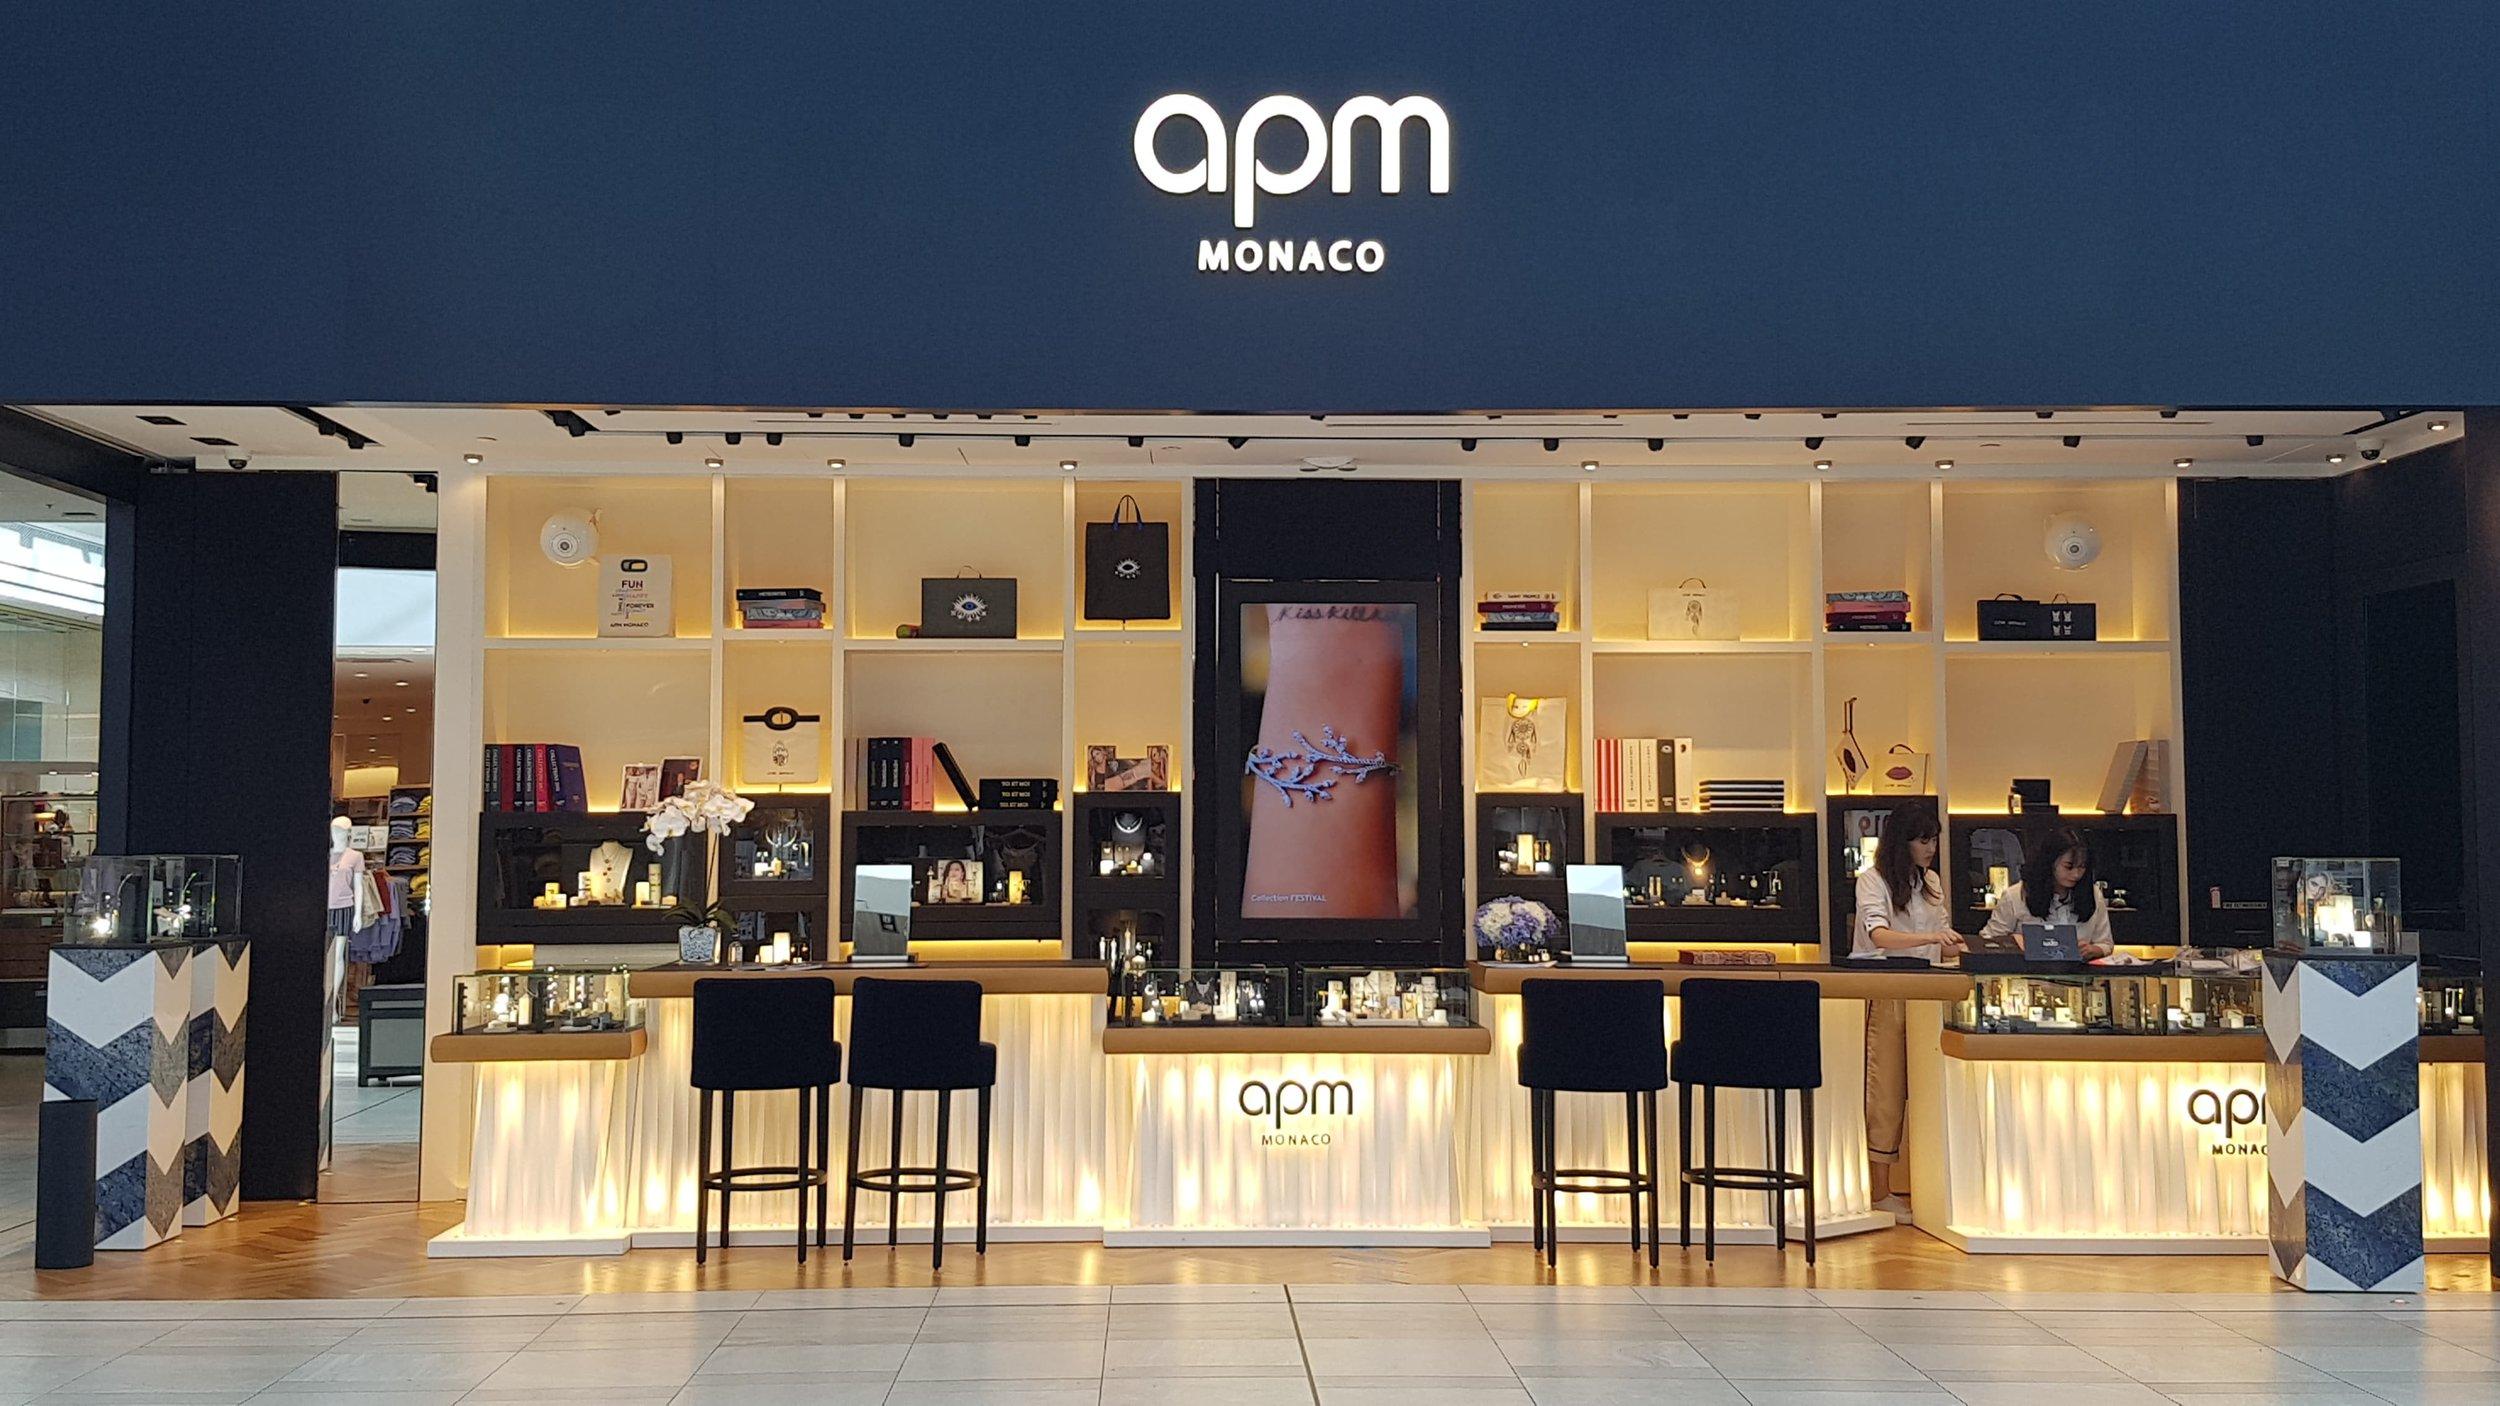 apm monaco's new cf richmond centre boutique PHOTO: ritchie po